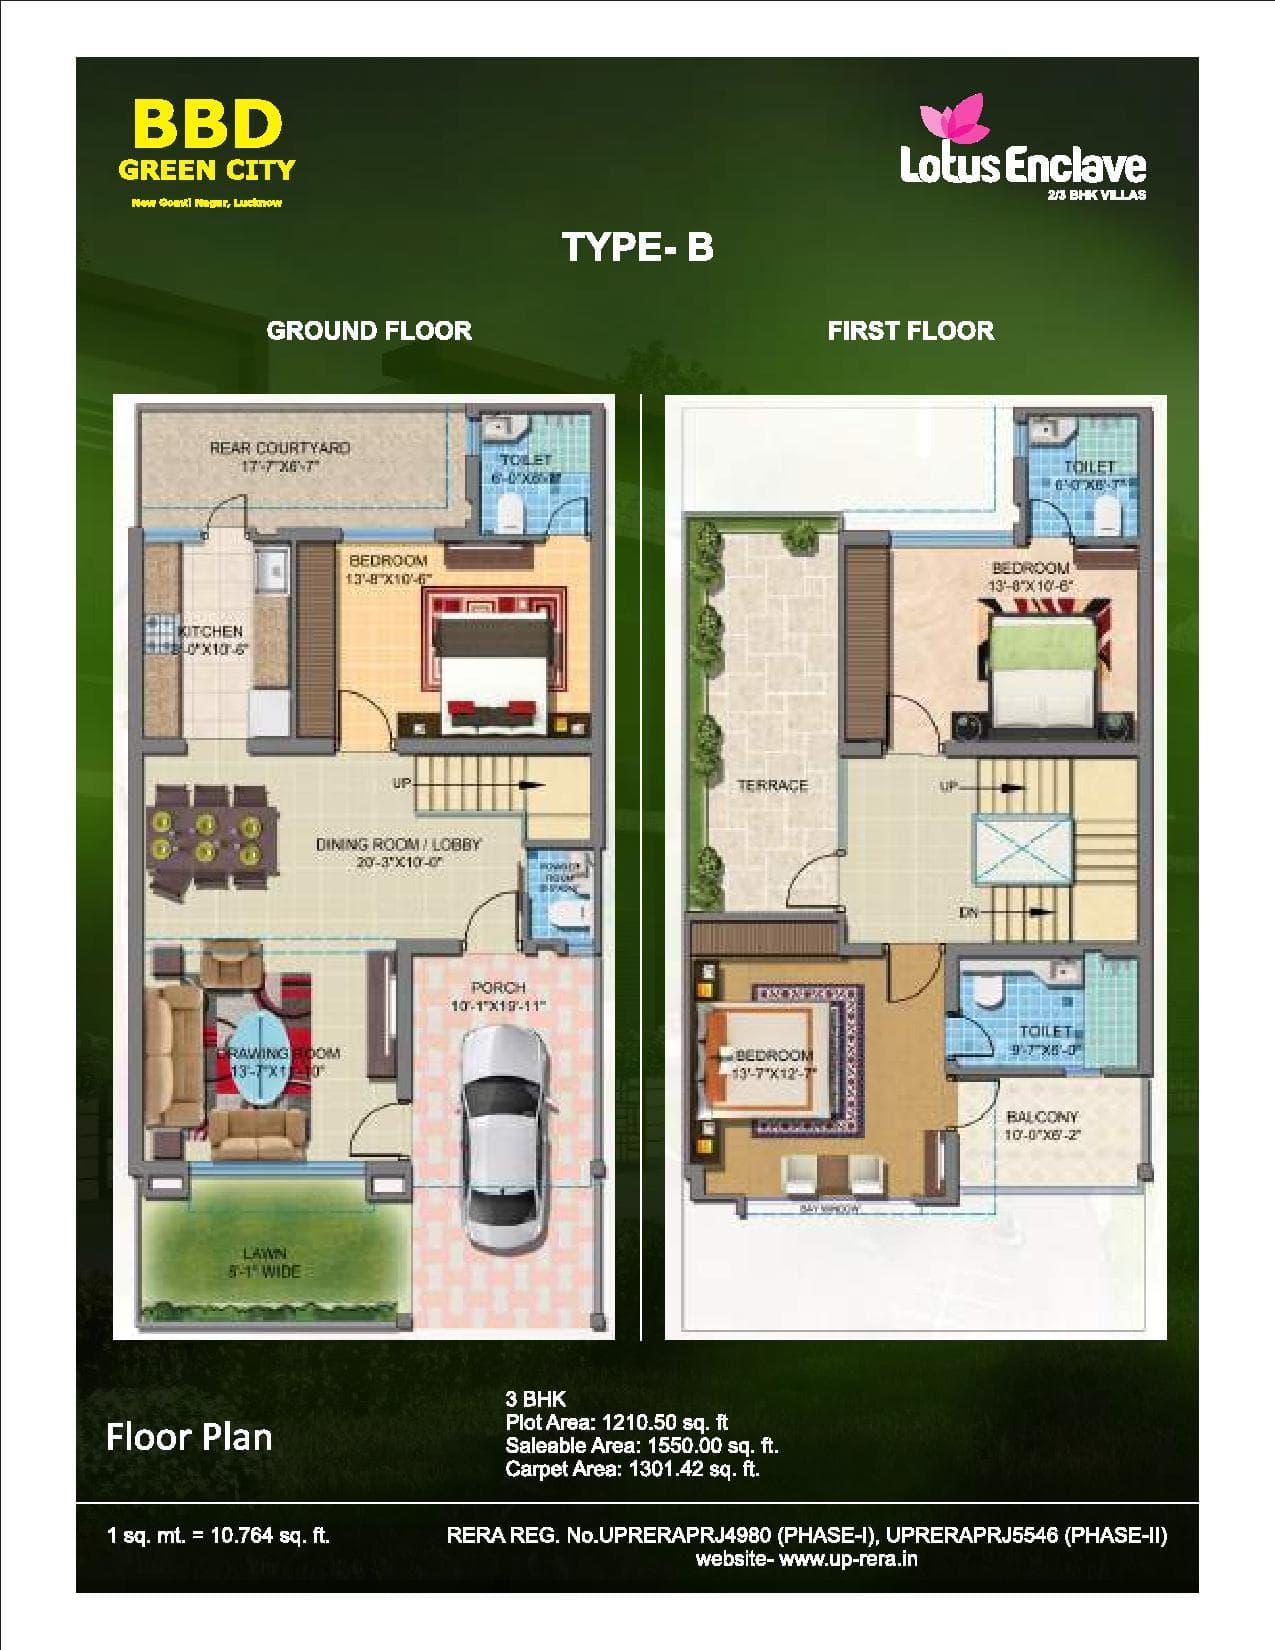 Lotus Enclave Type B Ground Floor First Floor